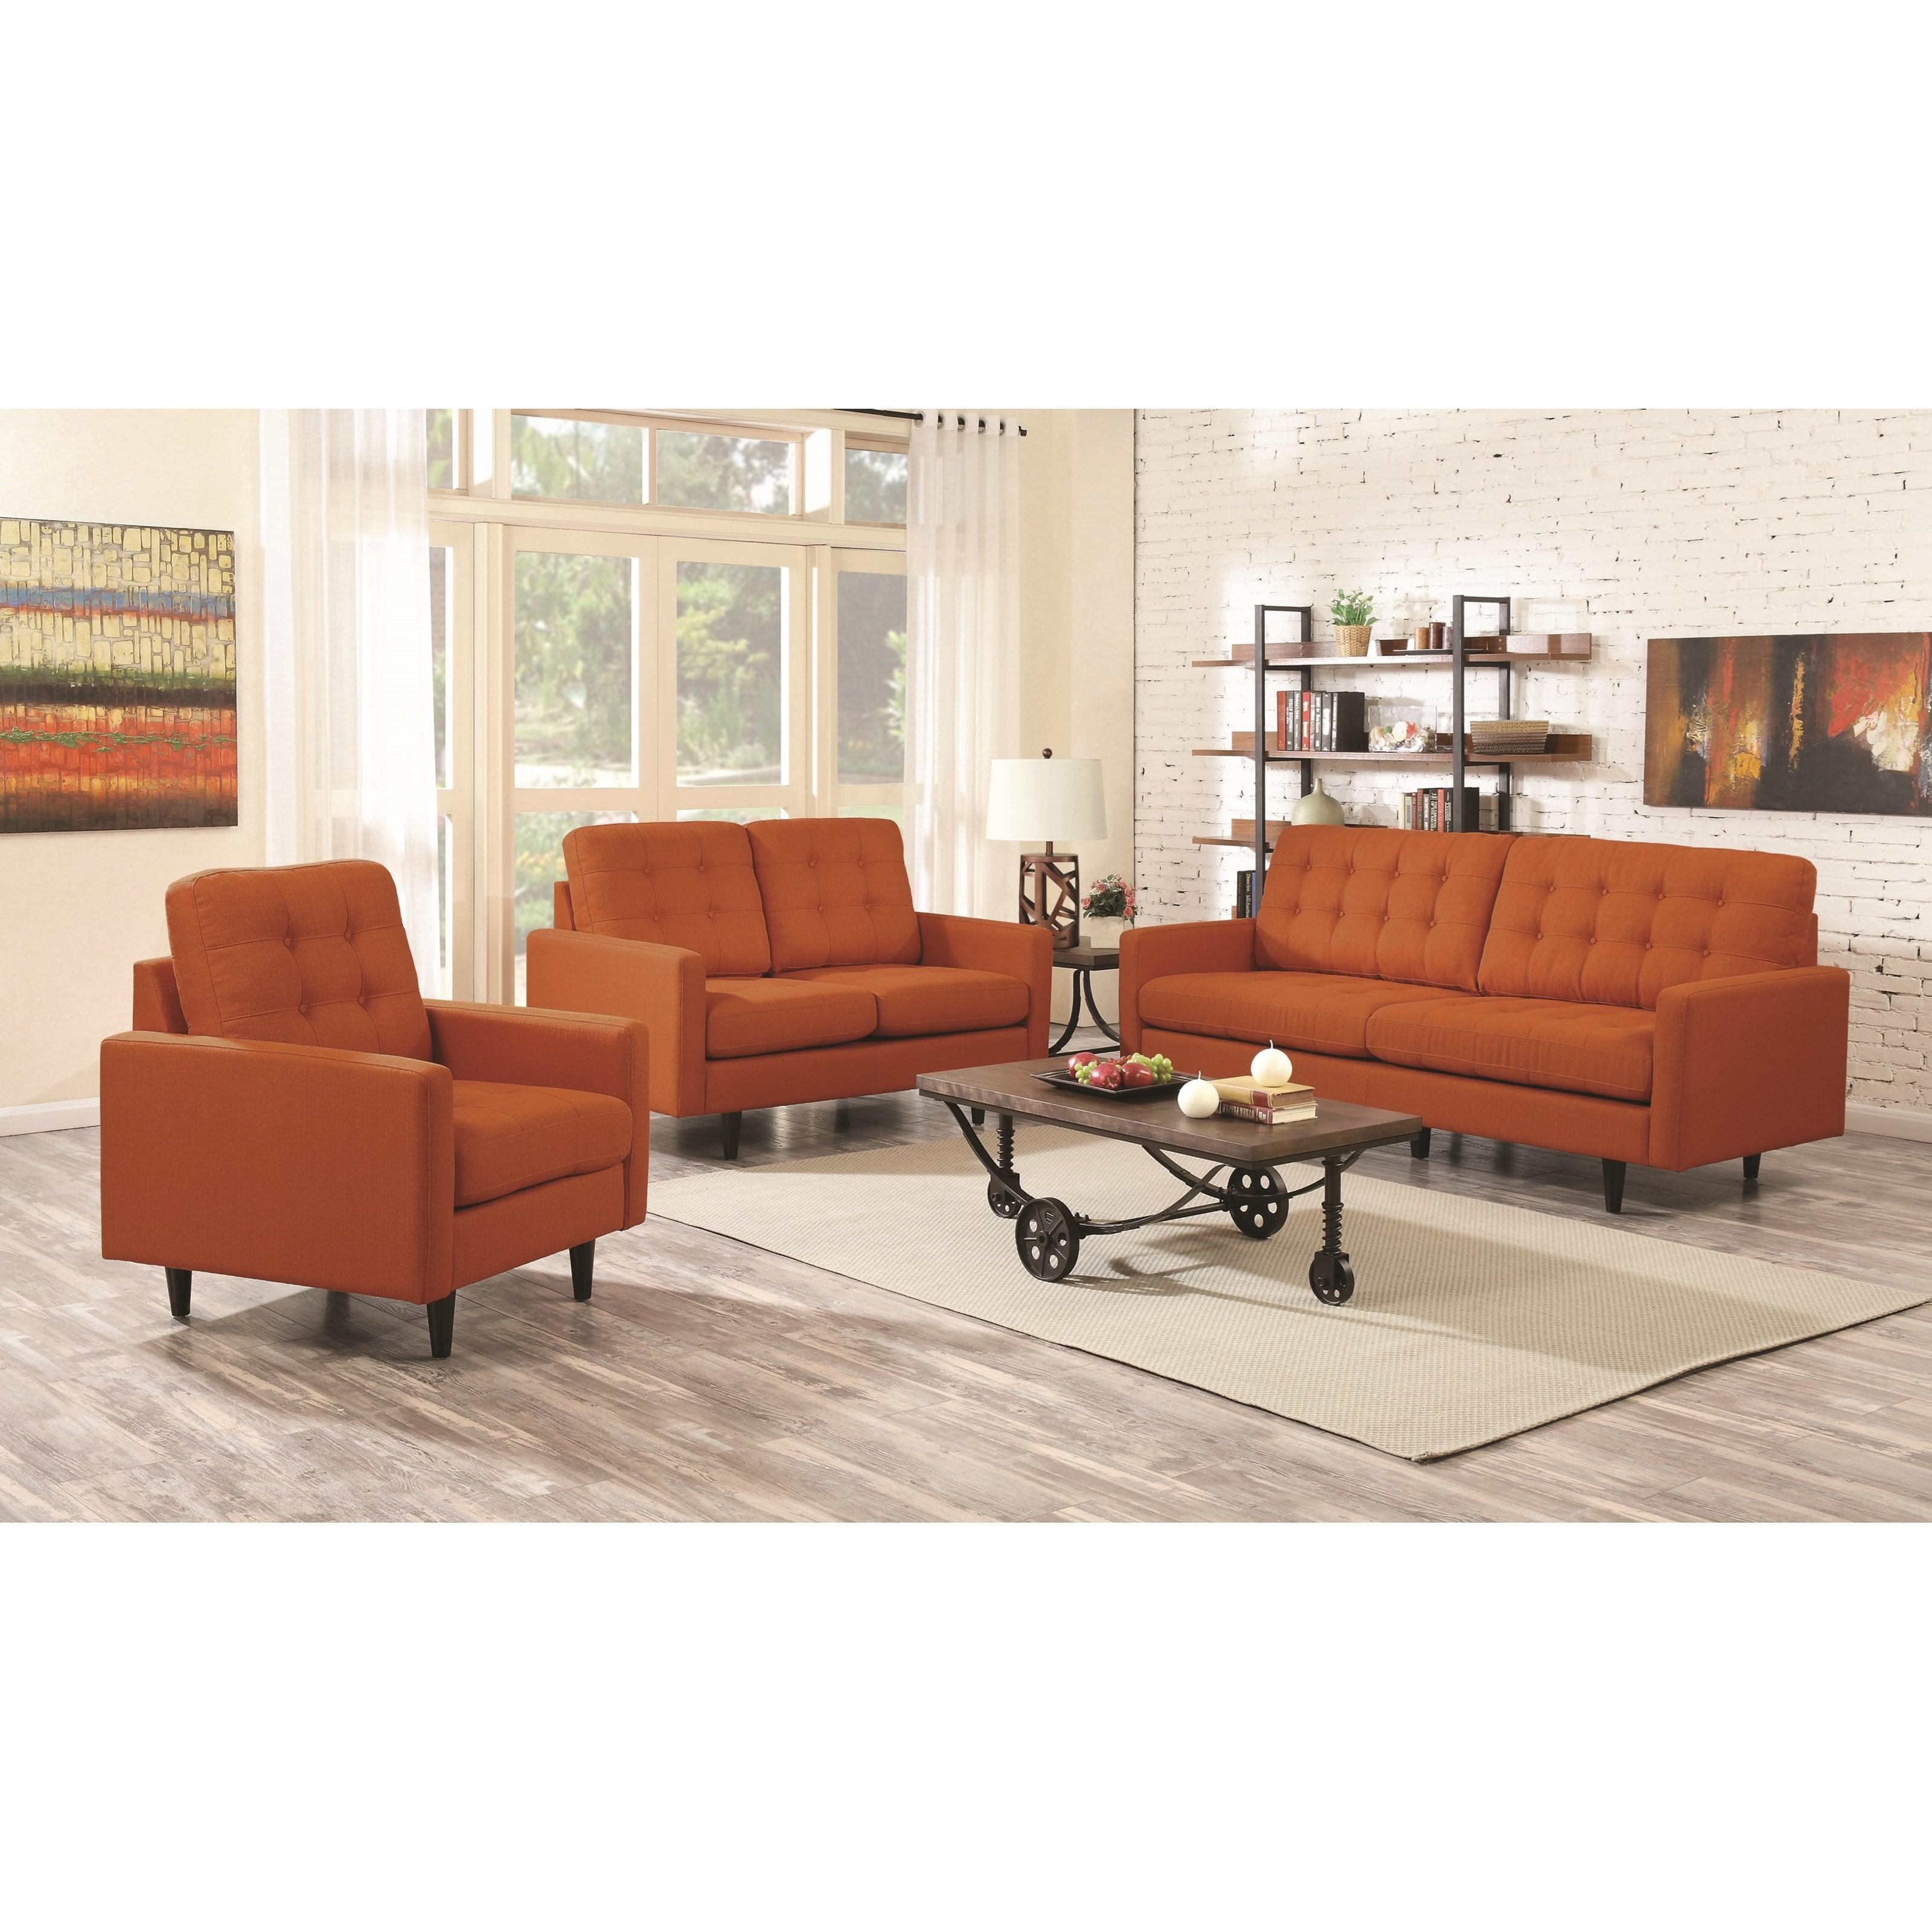 Mid Century Modern Living Room Furniture: Coaster Kesson Mid-Century Modern Living Room Group